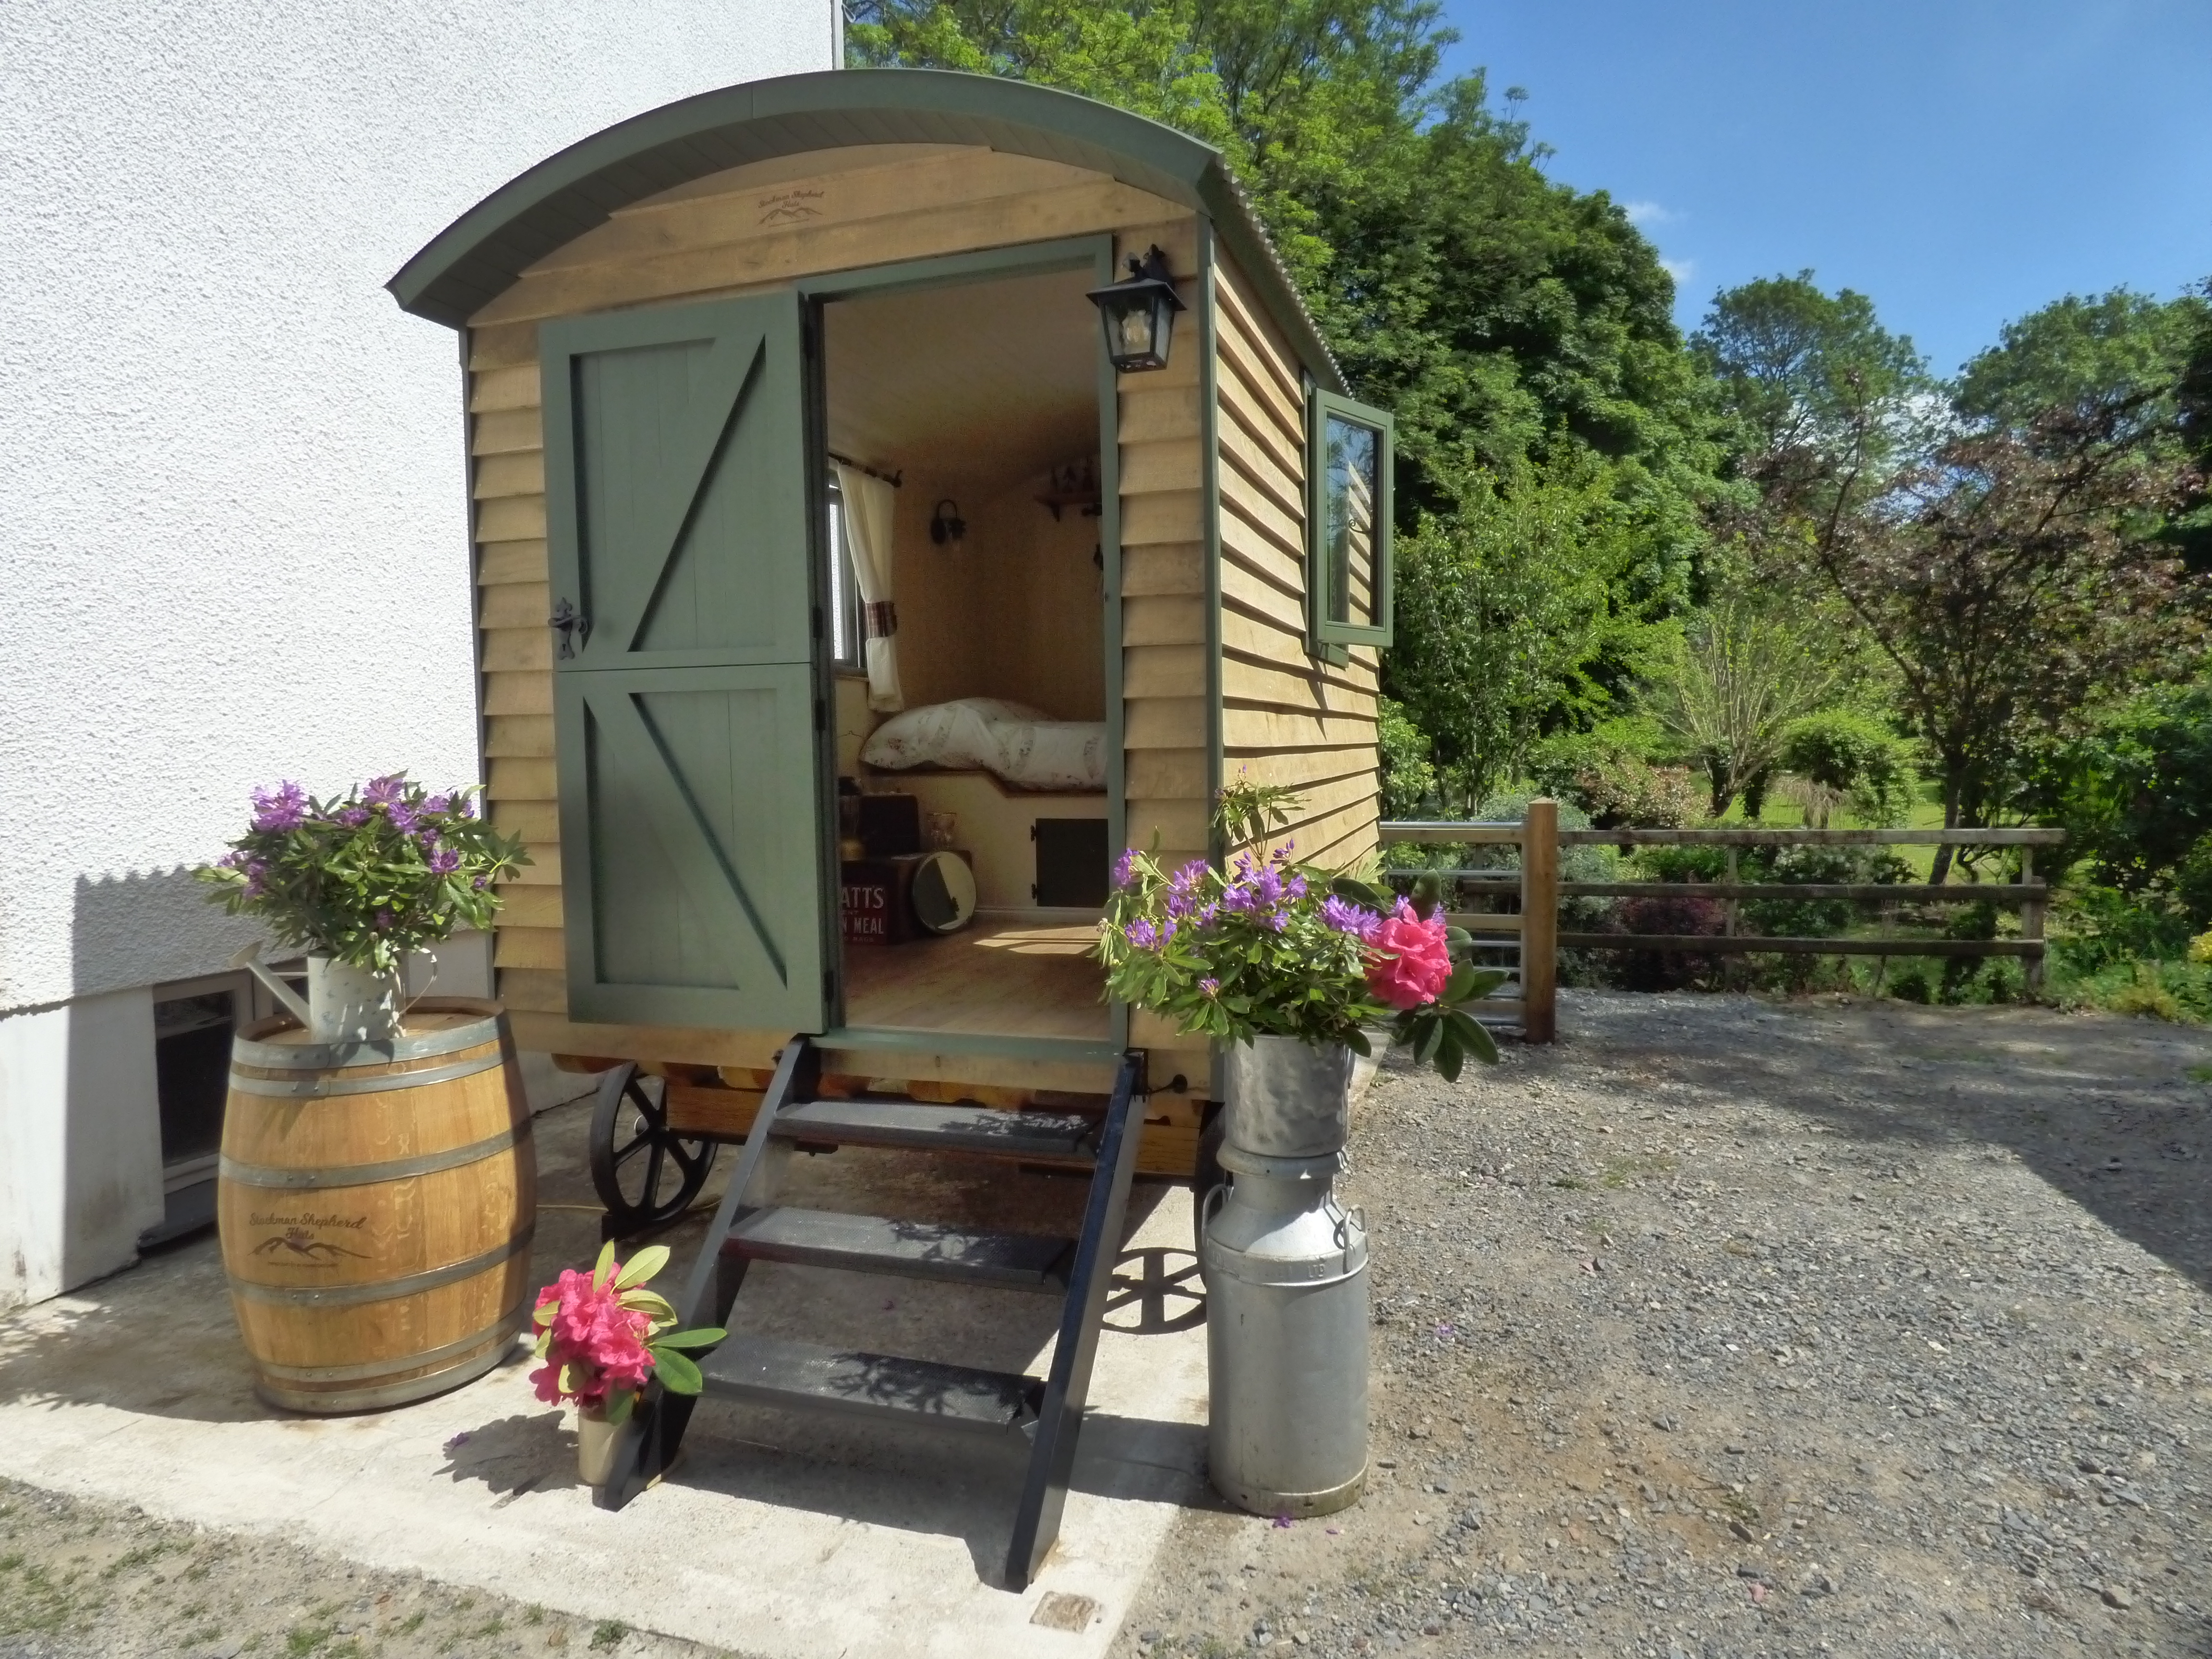 Shepherd's hut in the sunshine